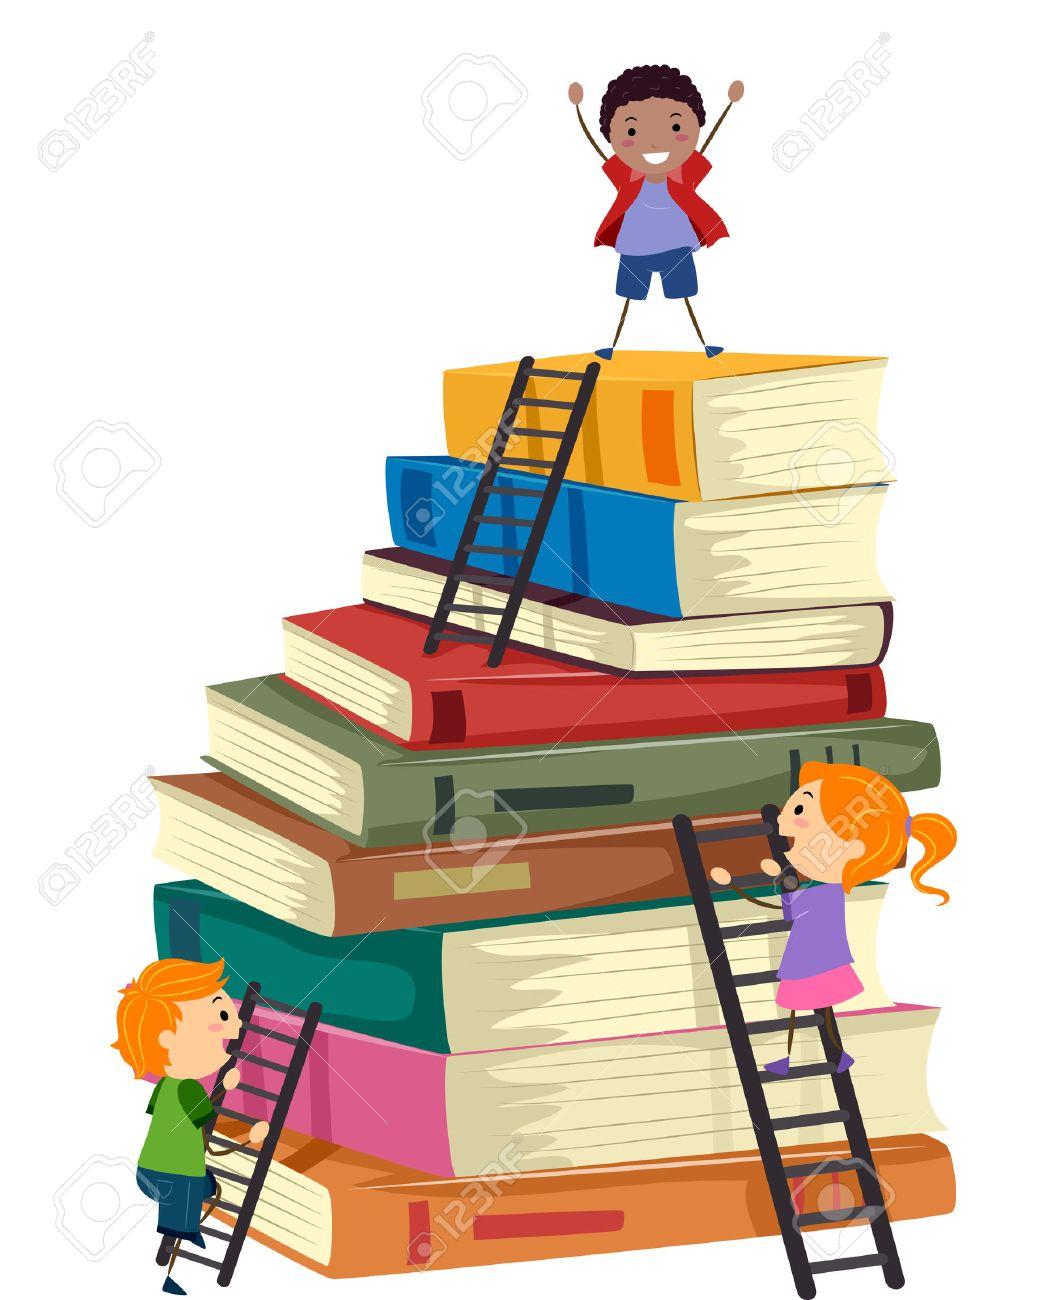 stickman illustration of kids climbing a tall stack of books stock rh 123rf com